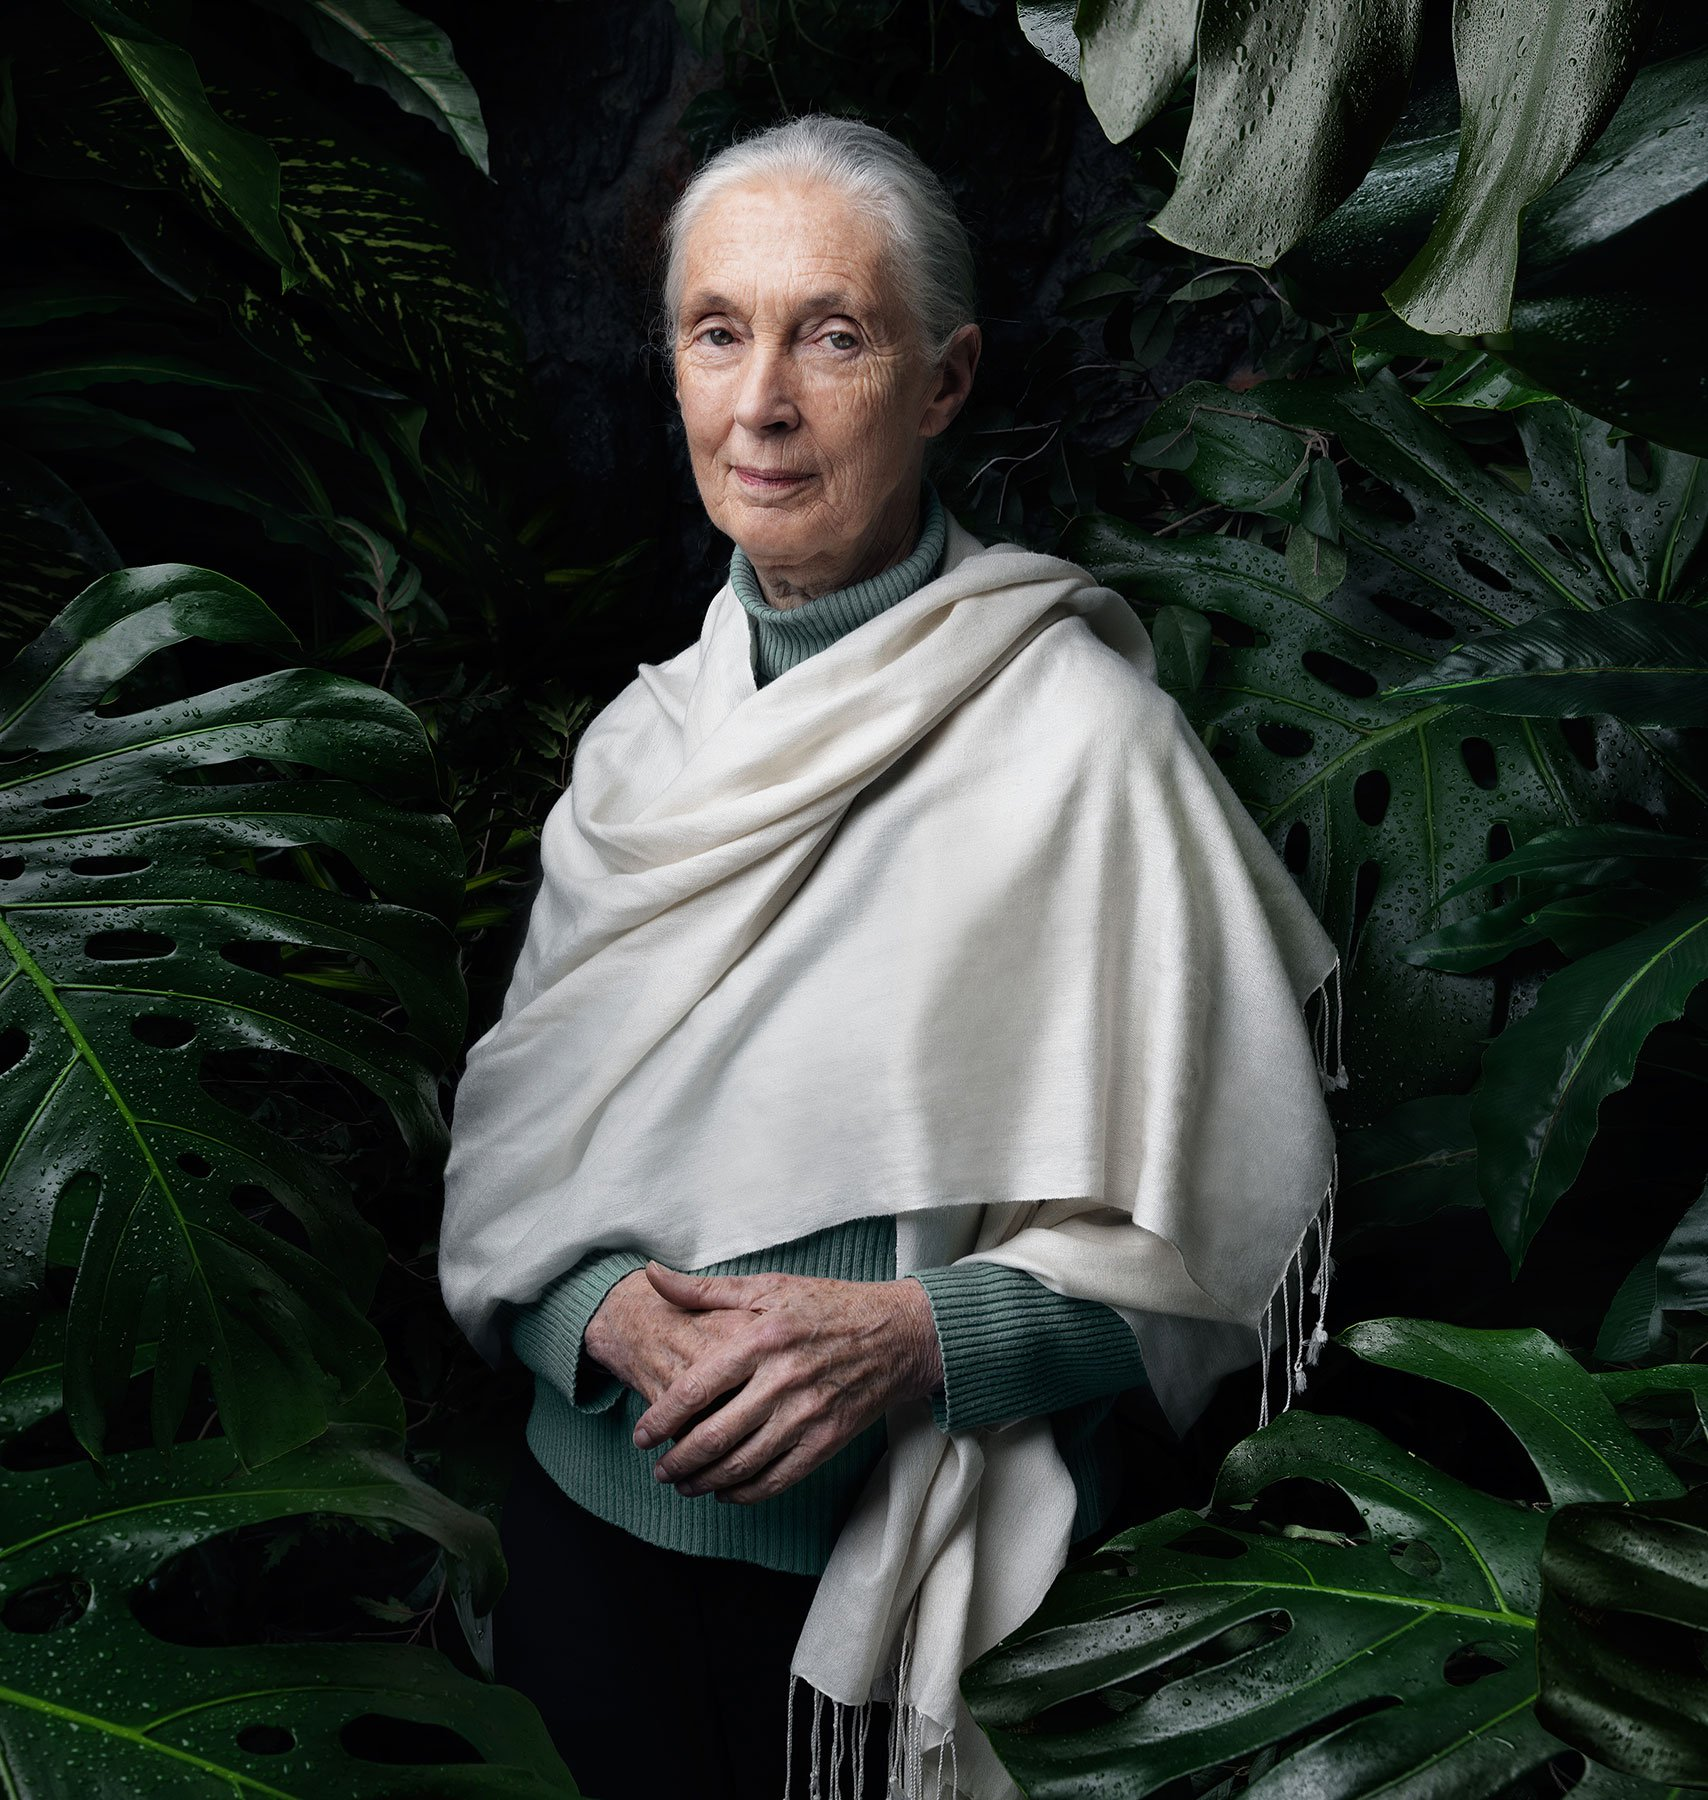 Jane Goodall: «Μπορούμε να μάθουμε πολλά από αυτή την πανδημία»